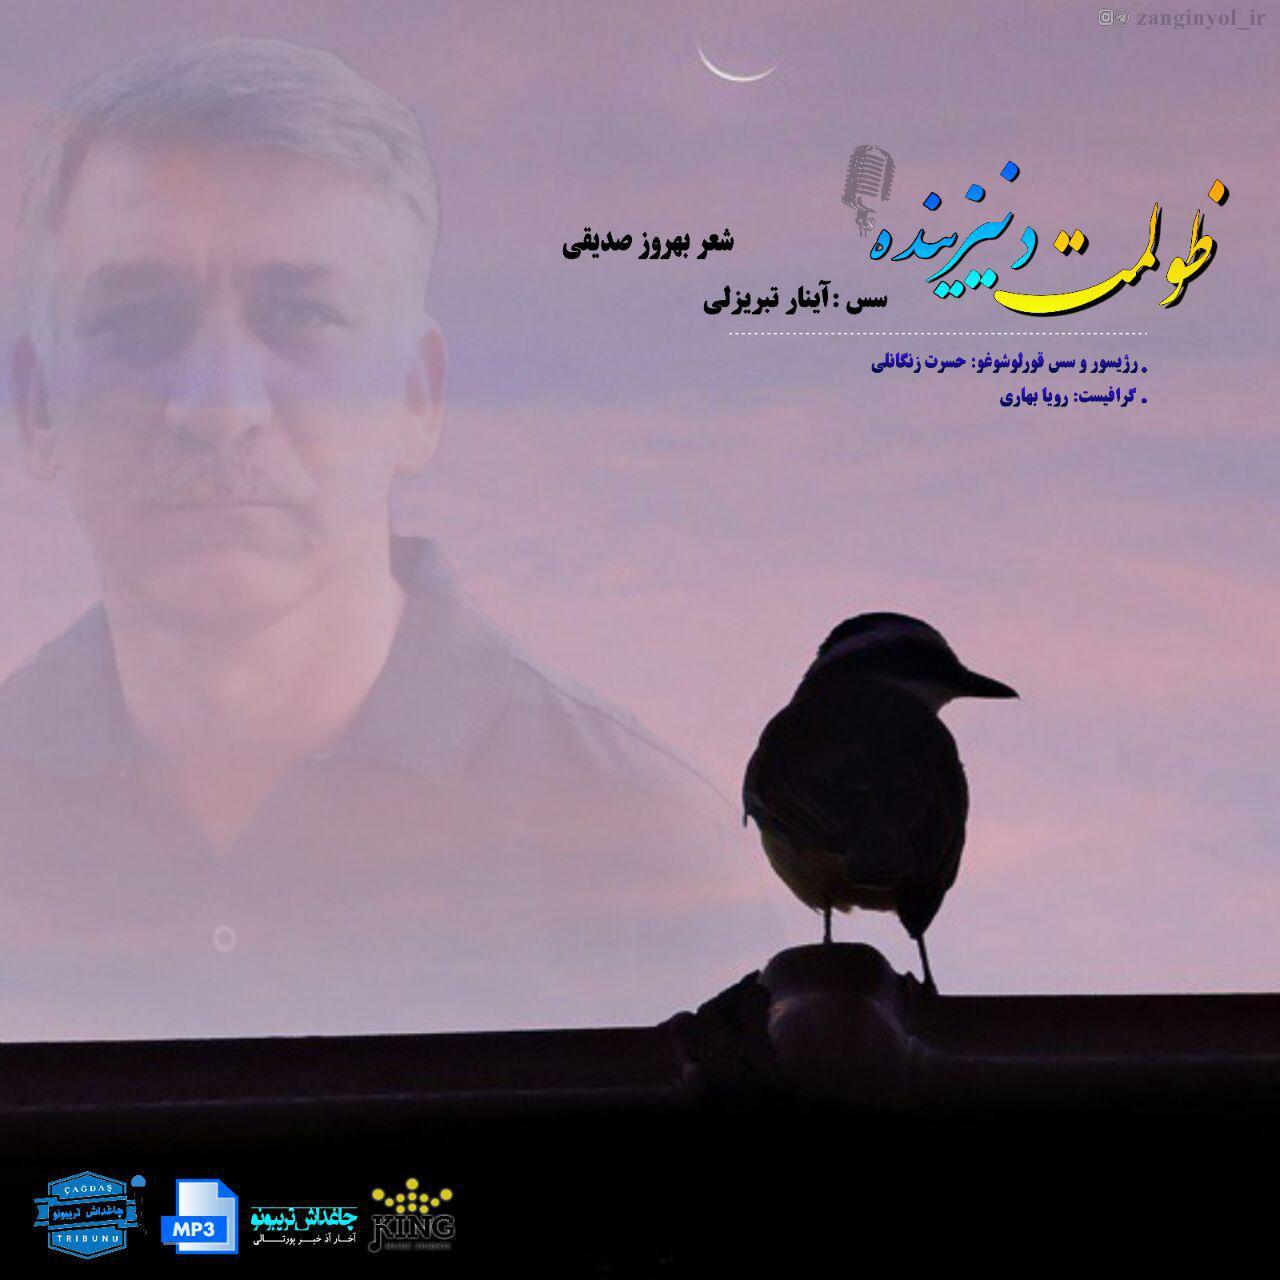 http://s9.picofile.com/file/8334788568/08Aynar_Tabrizli_Zulmet_Denizinde.jpg